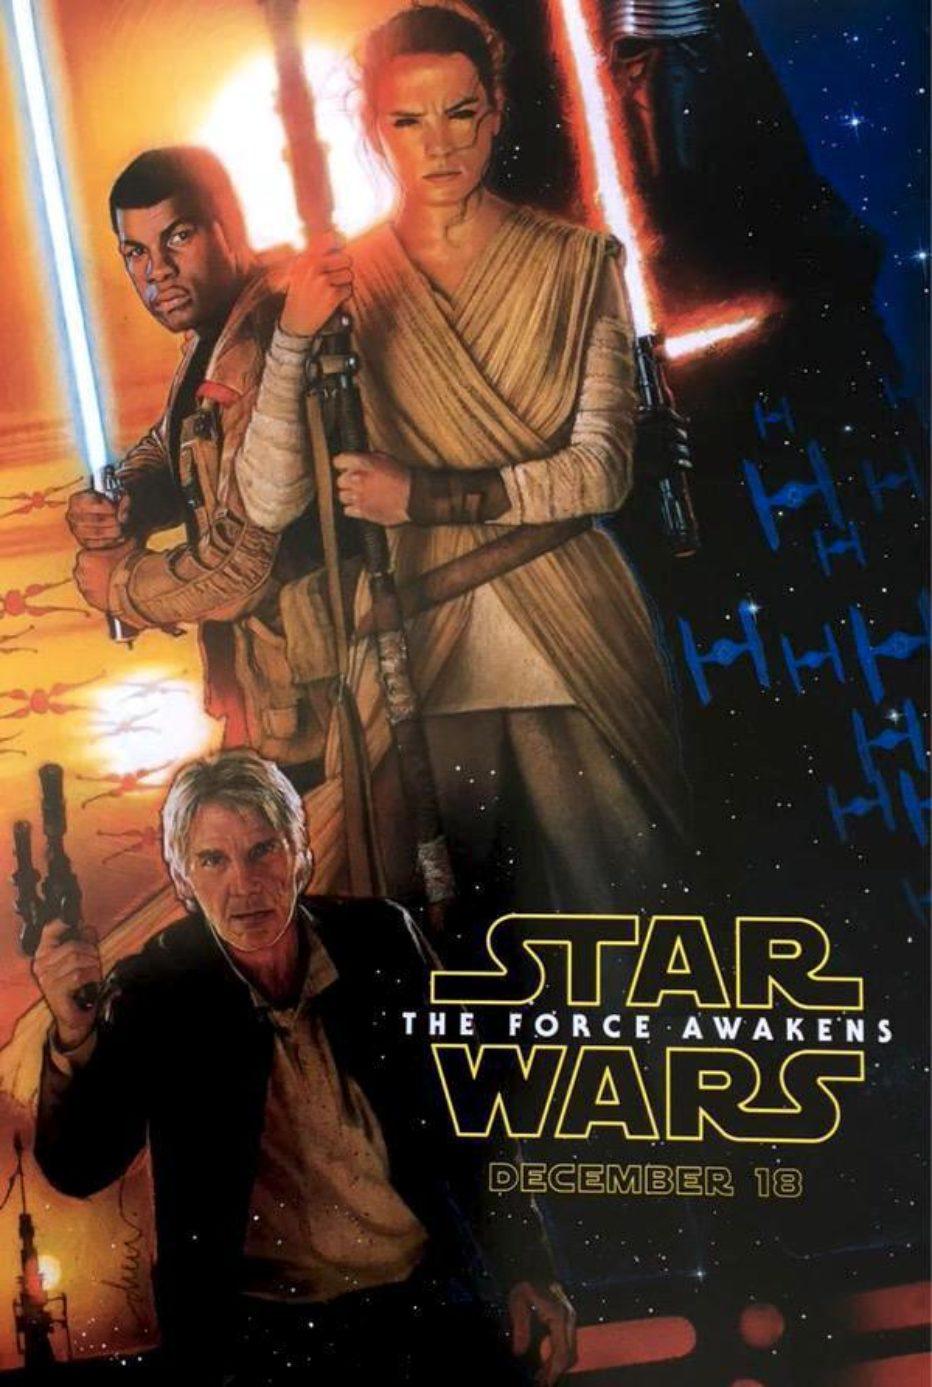 Primer poster de SW : The force Awakens y primera imagen de Rogue one